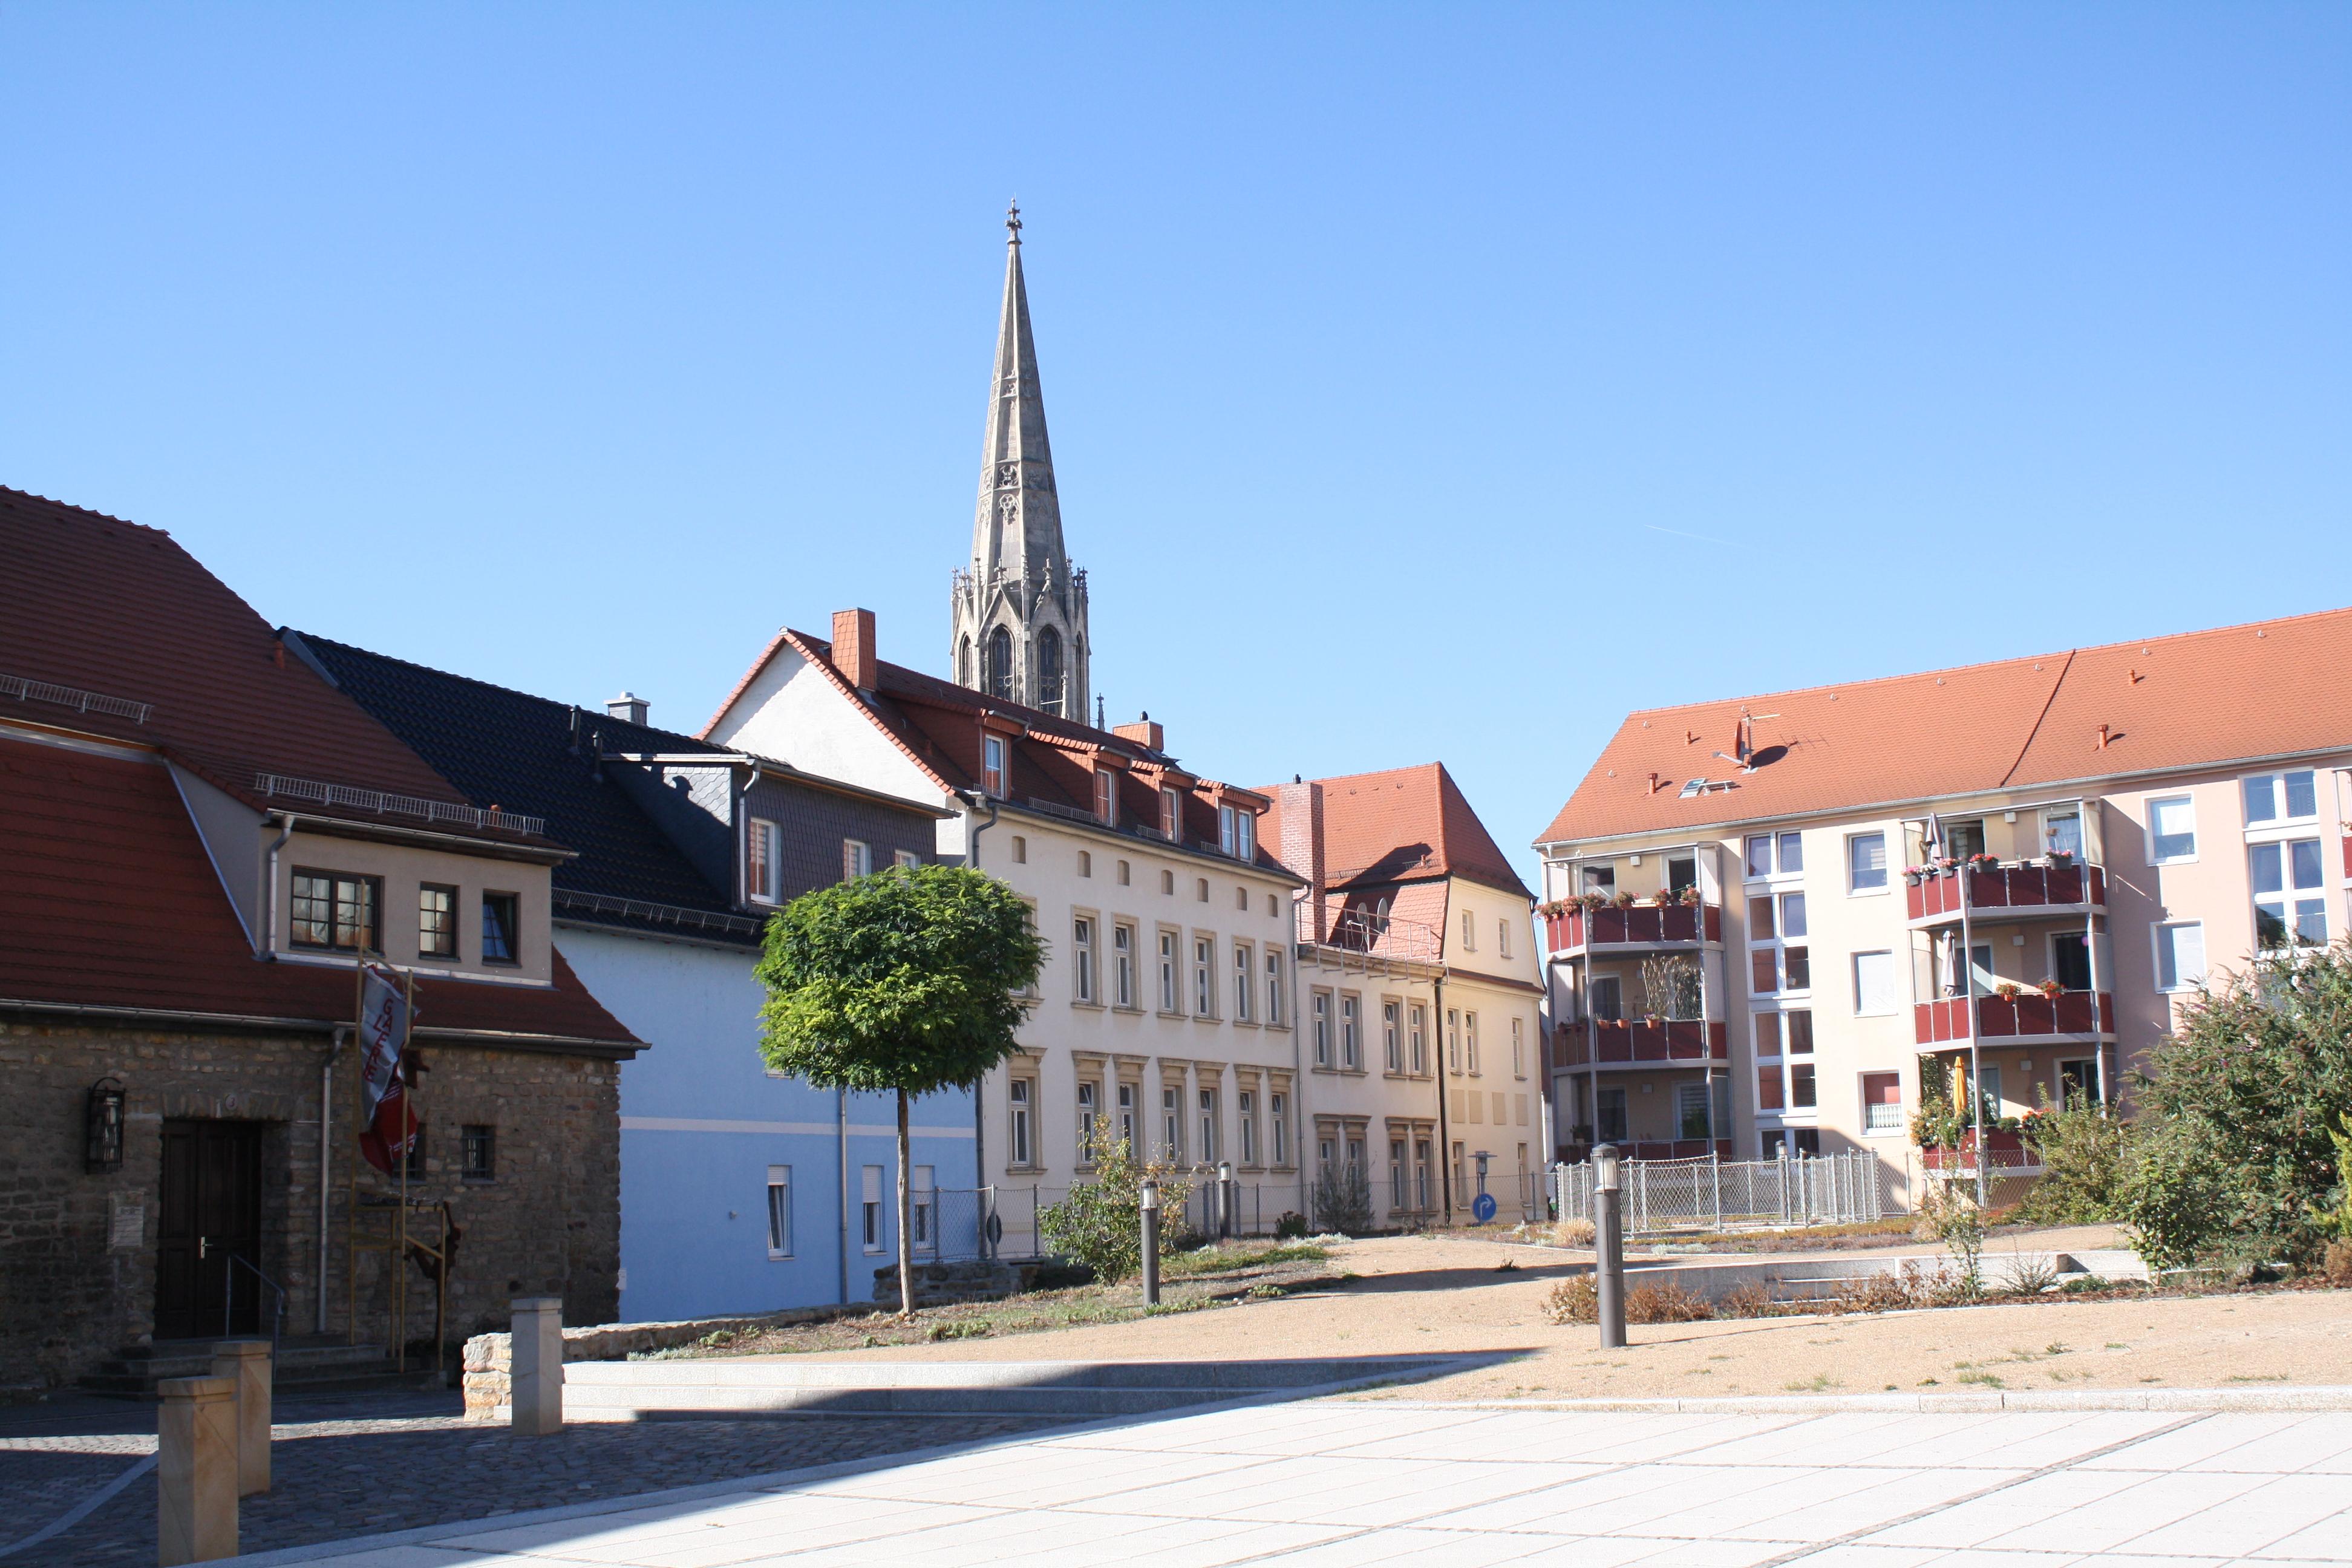 Merseburg Kino